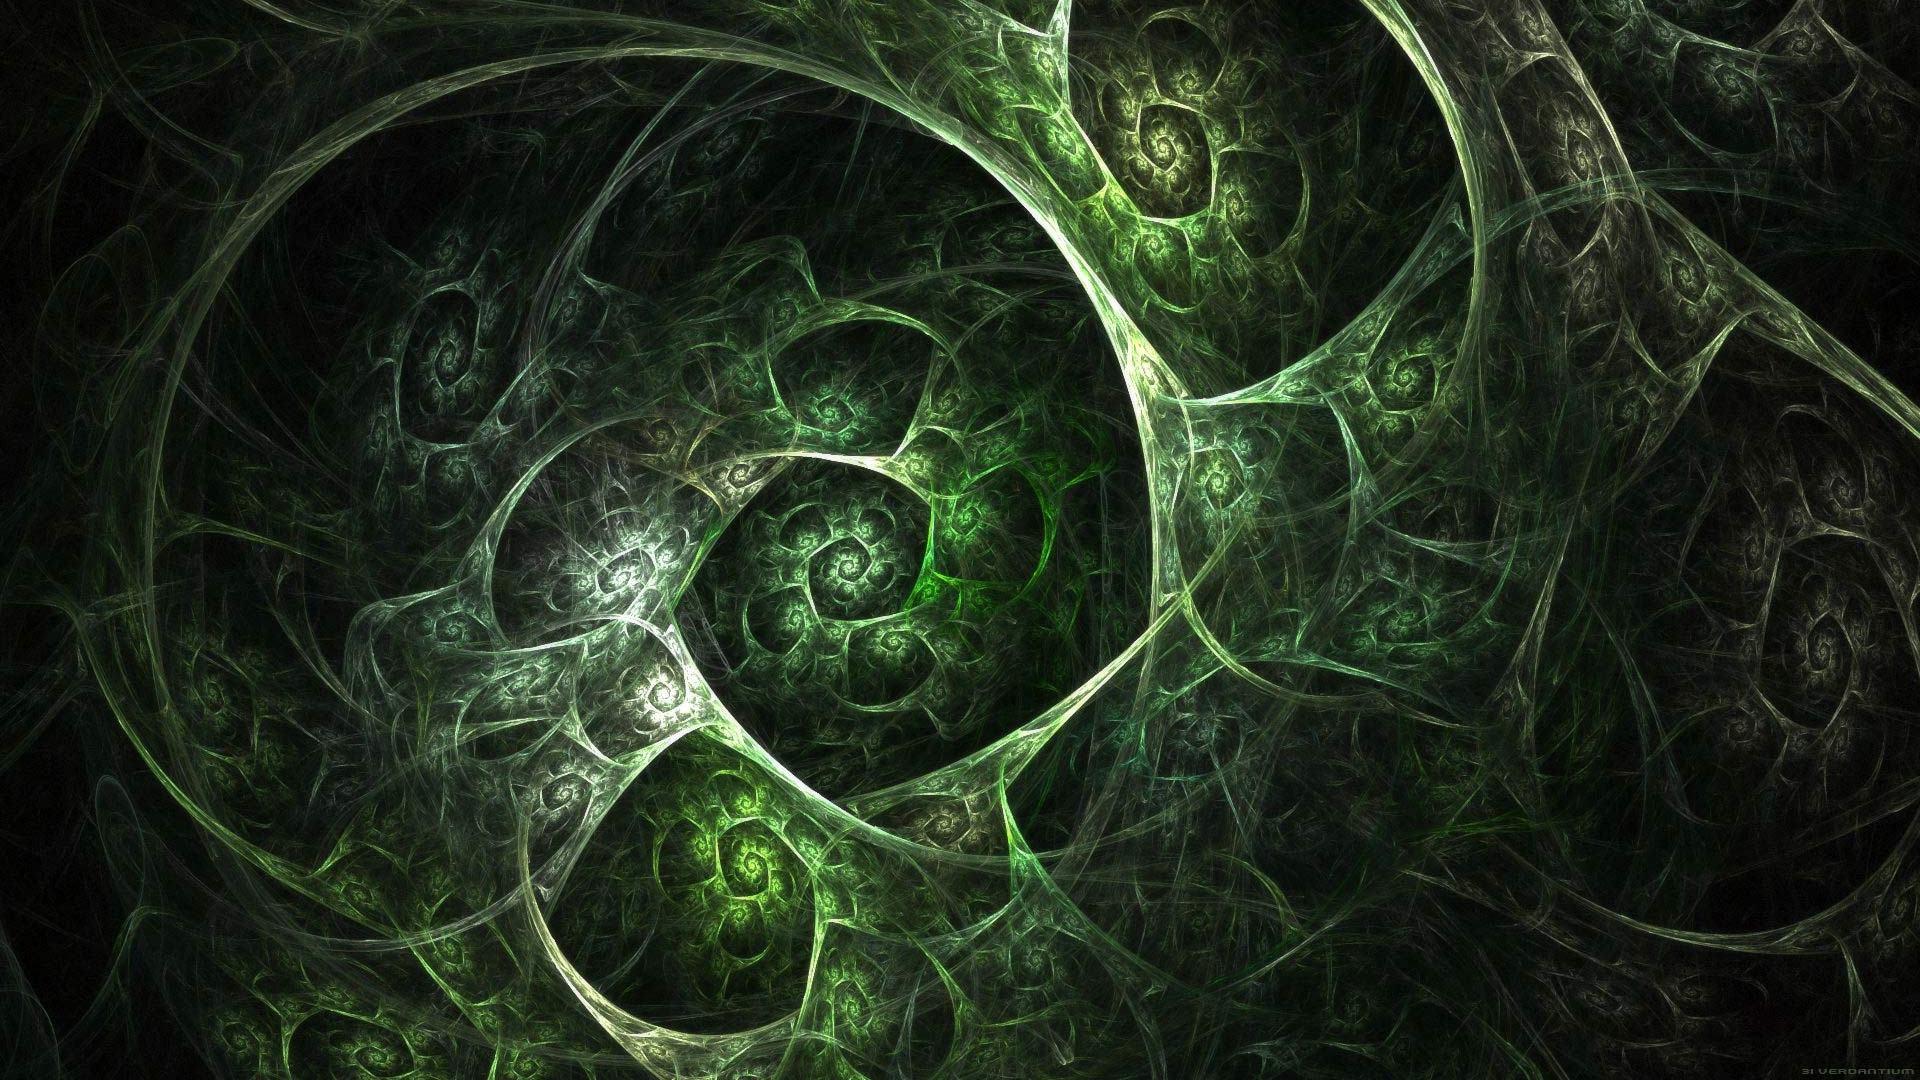 Green Fractal Wallpaper Hd Wallpapers Xpx